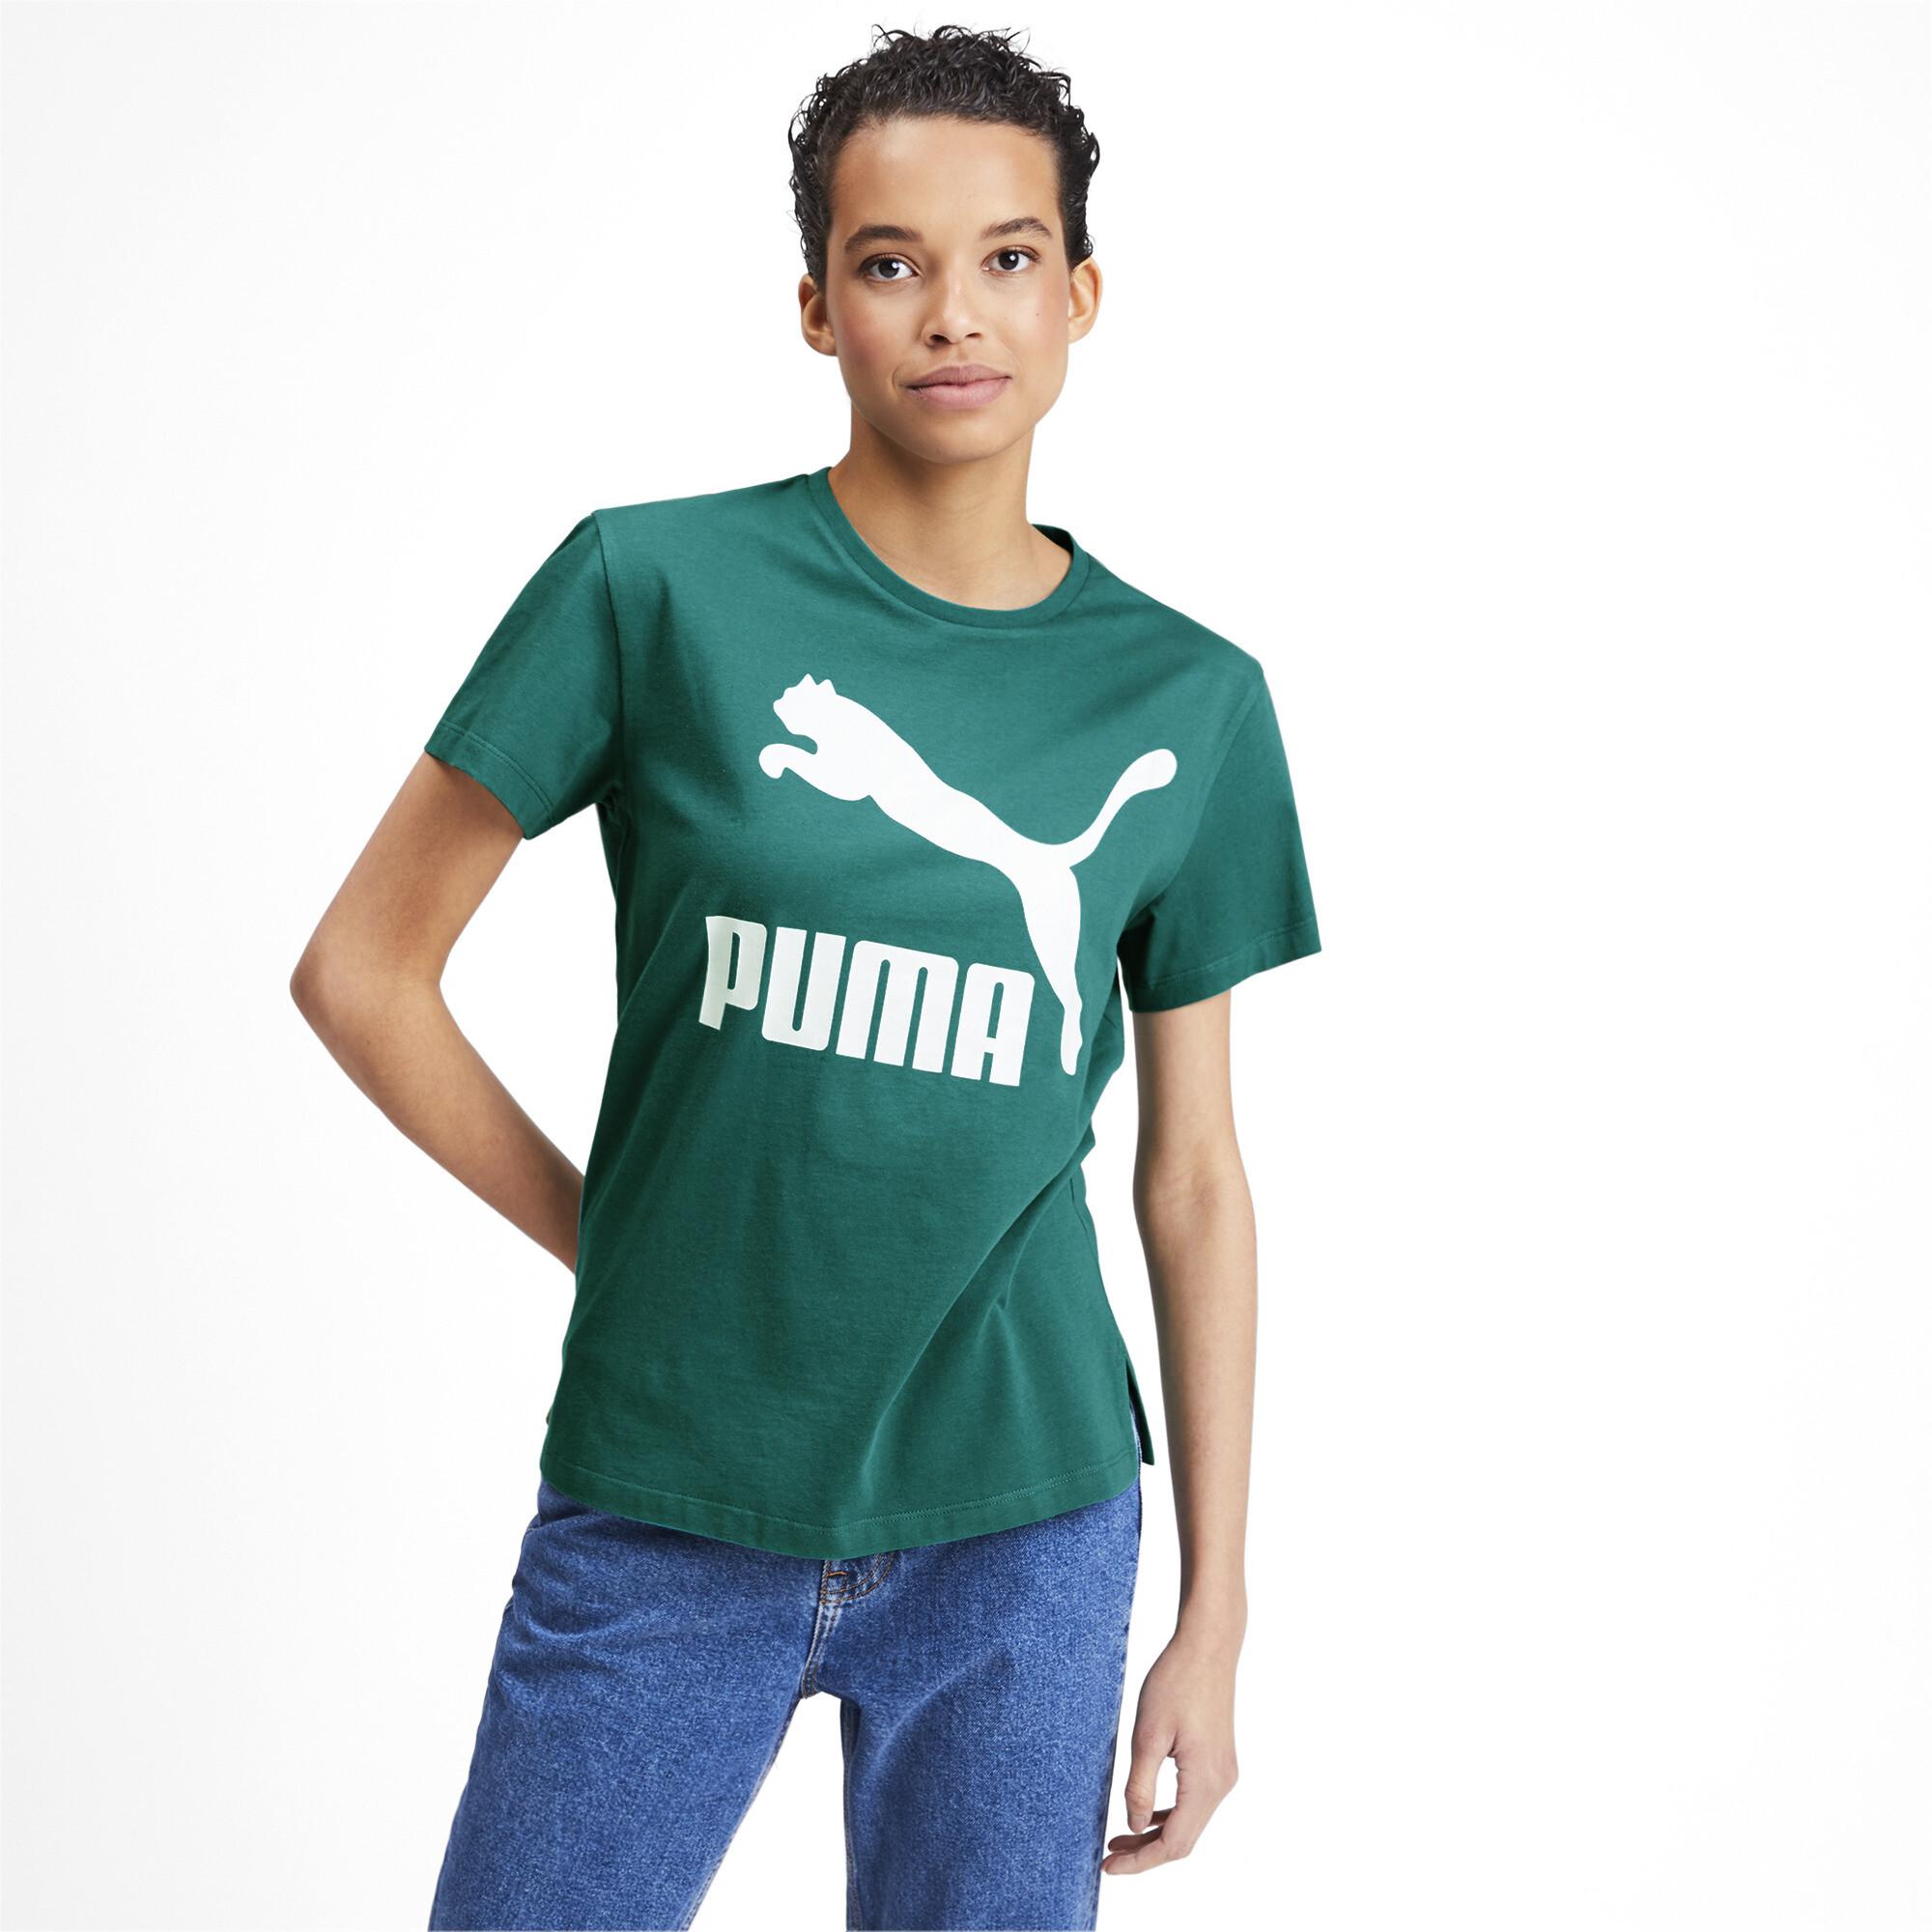 PUMA-Classics-Women-039-s-Logo-Tee-Women-Tee-Sport-Classics thumbnail 17